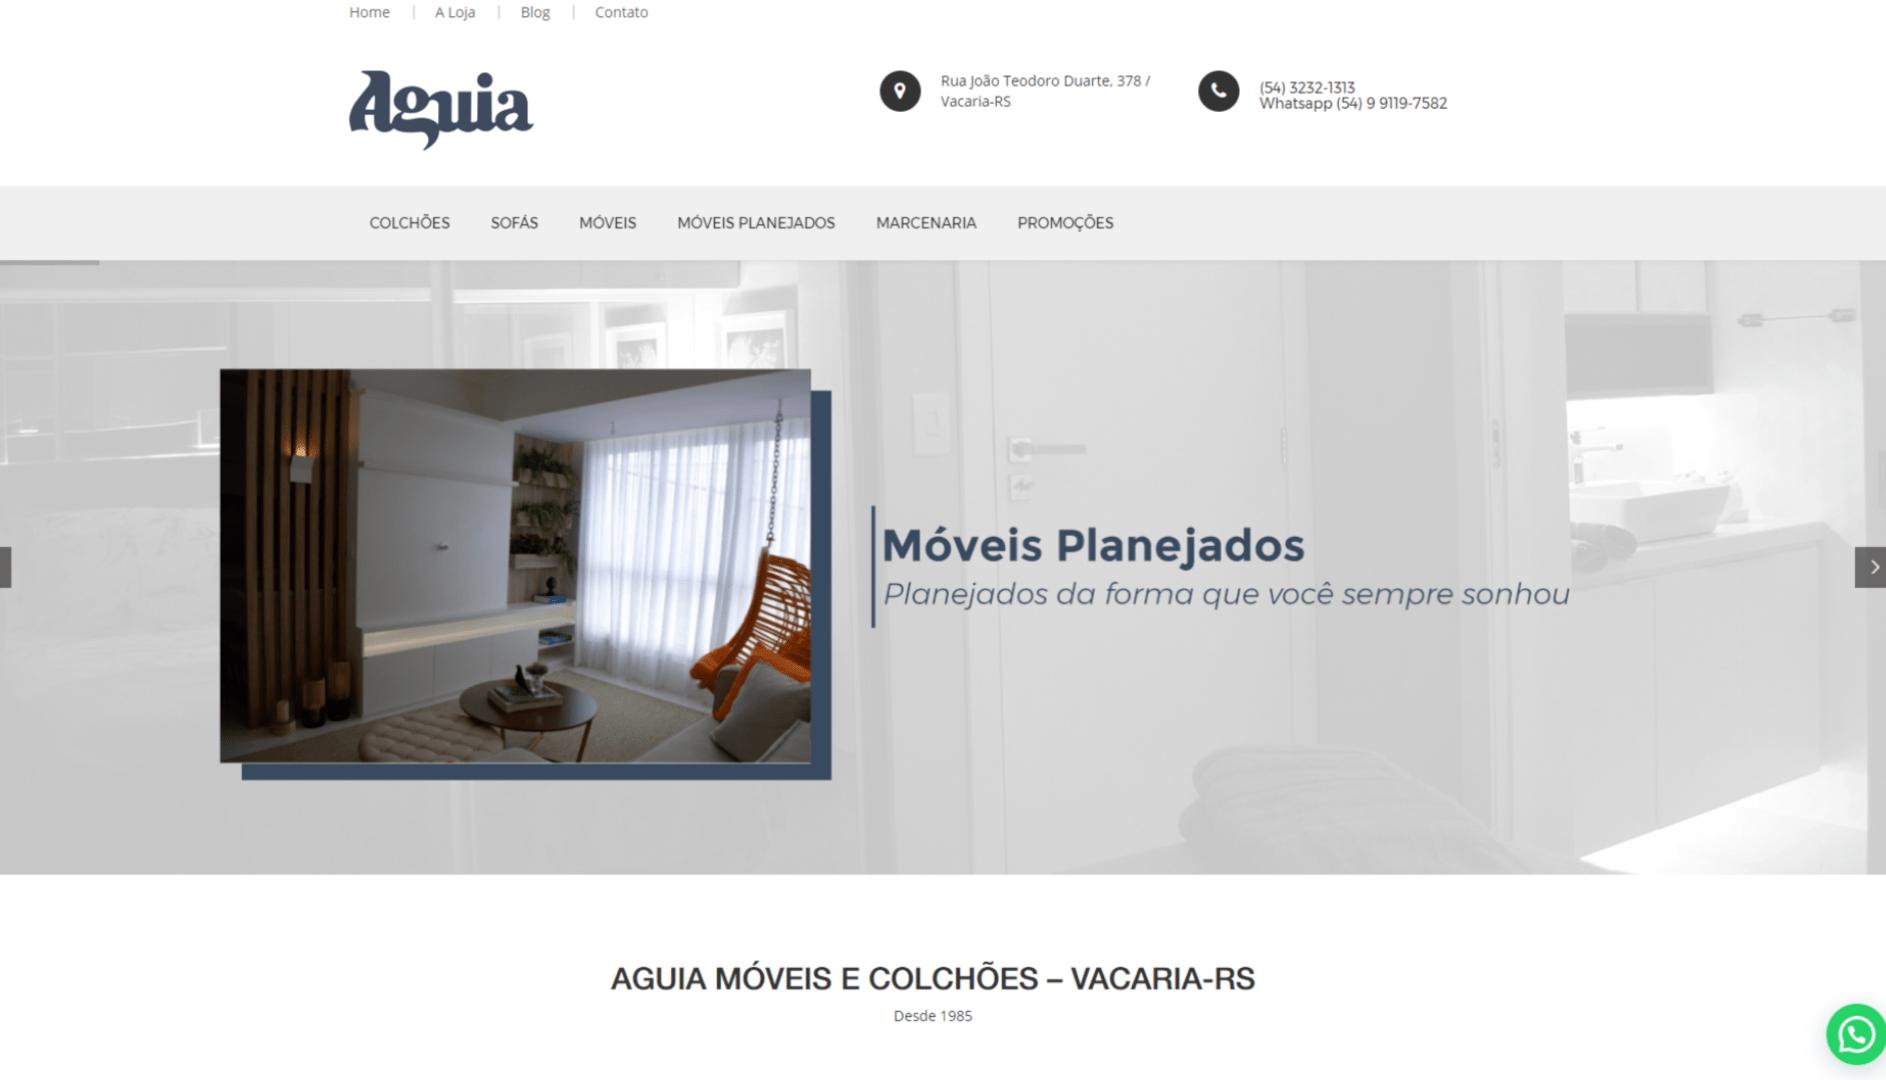 https://www.6i.com.br/case/aguia/